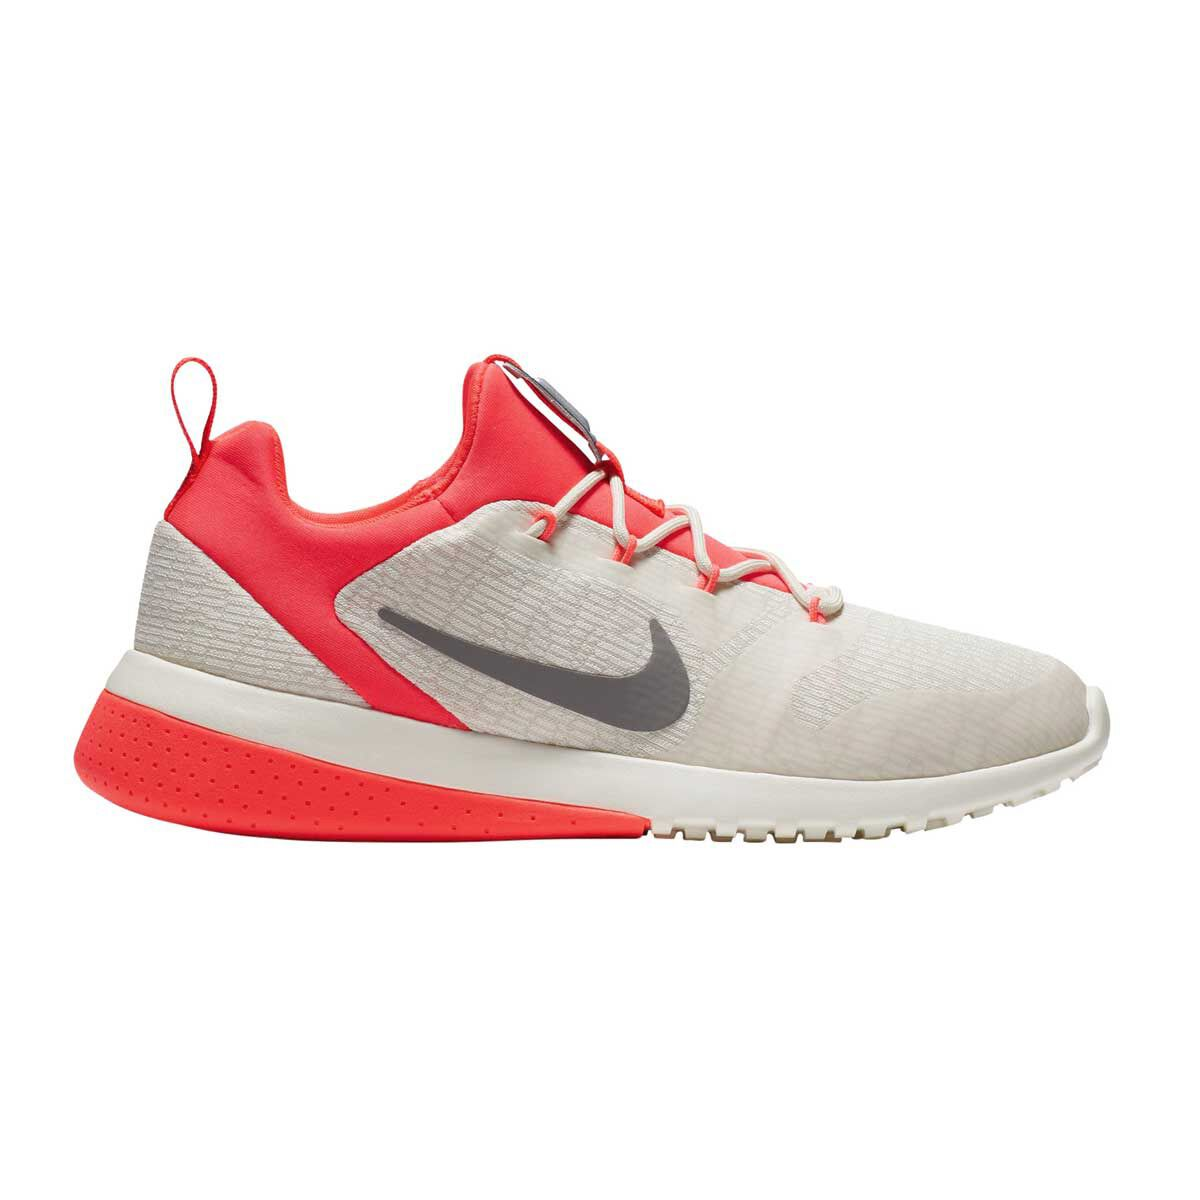 Nike CK Racer Womens Running Shoes